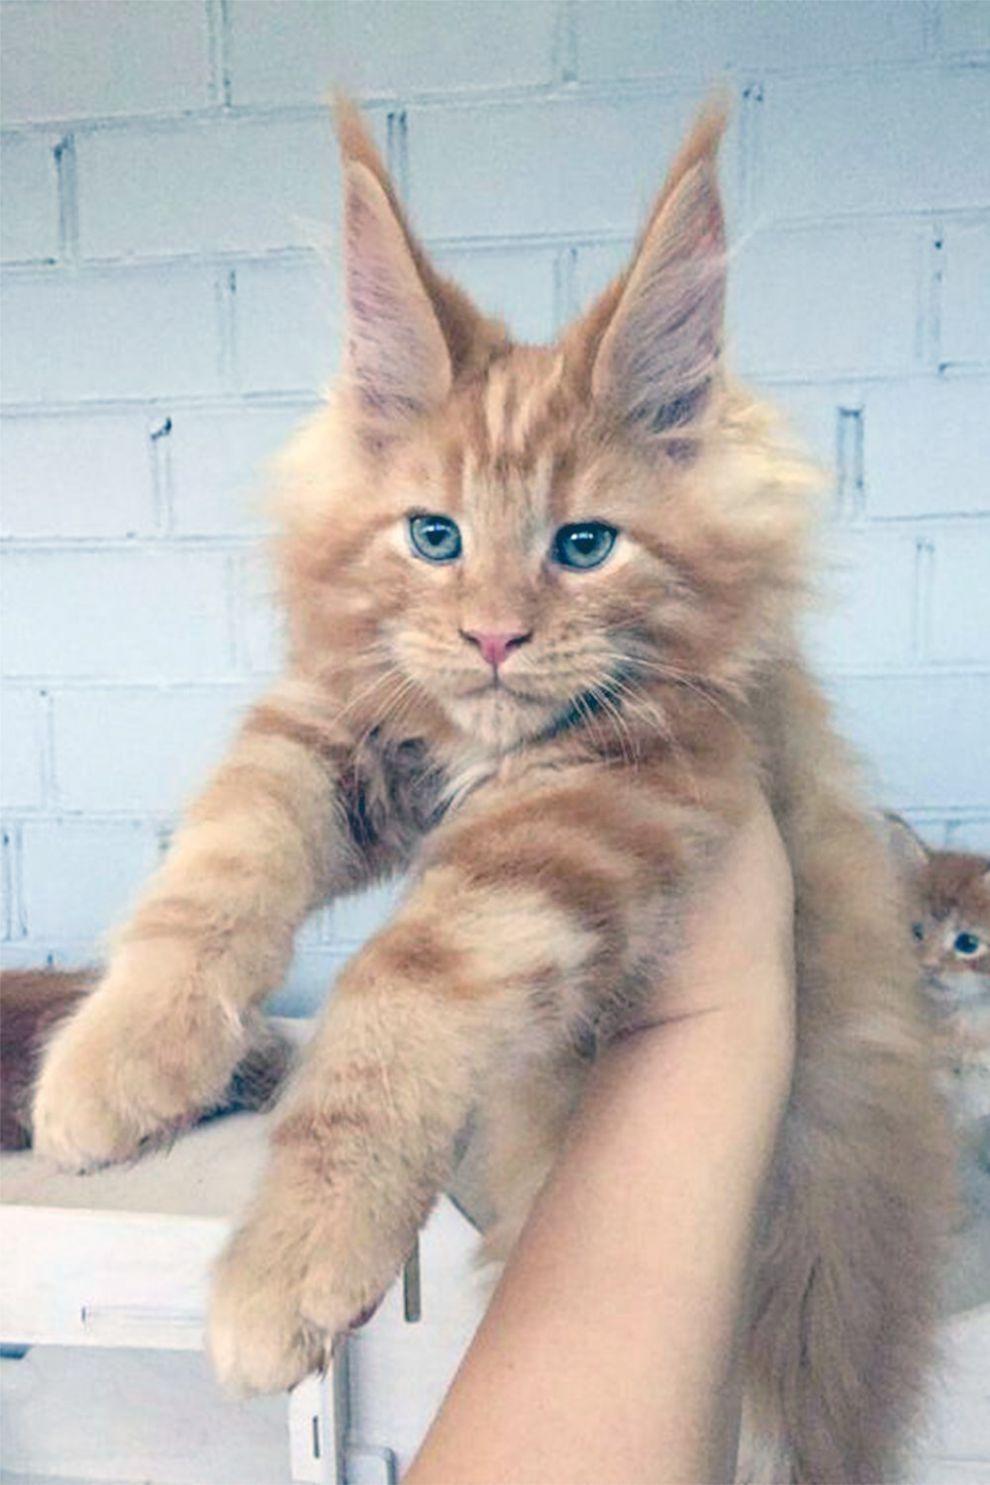 The Snack Thief Strikes Again Cute Baby Animals Kittens Cutest